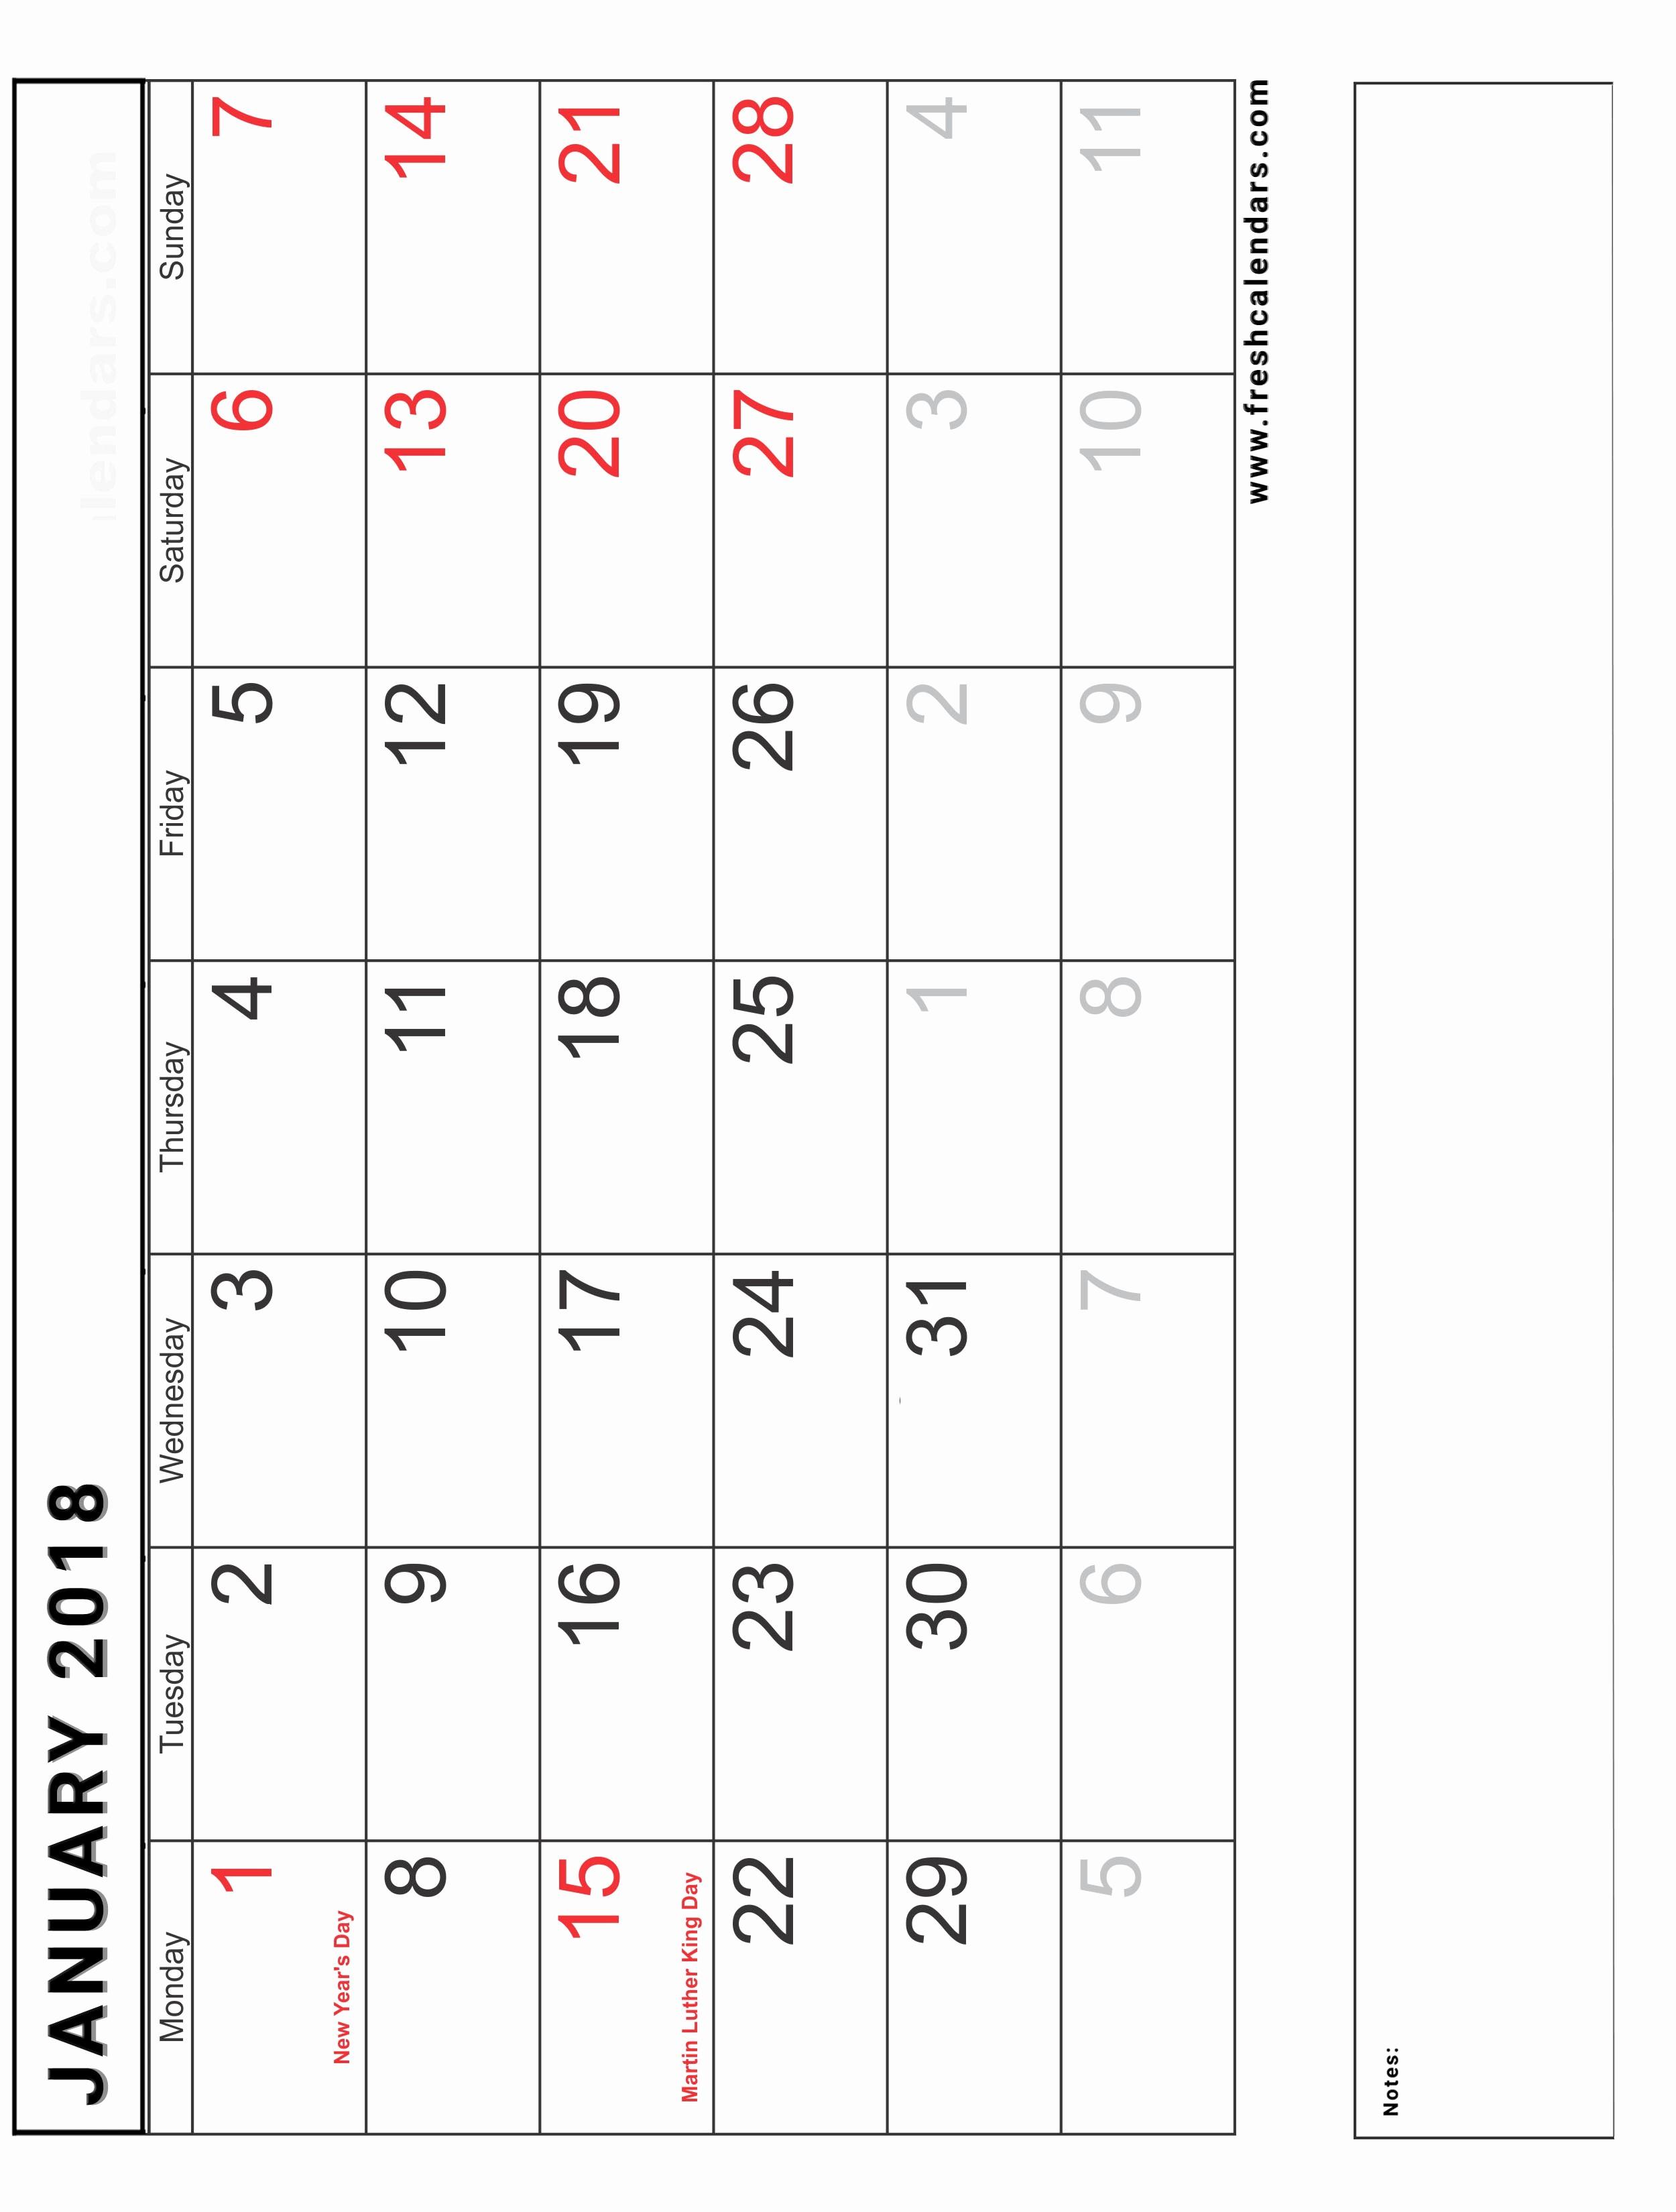 Calendar 2018 Printable with Holidays Unique Blank January 2018 Calendar Printable Templates